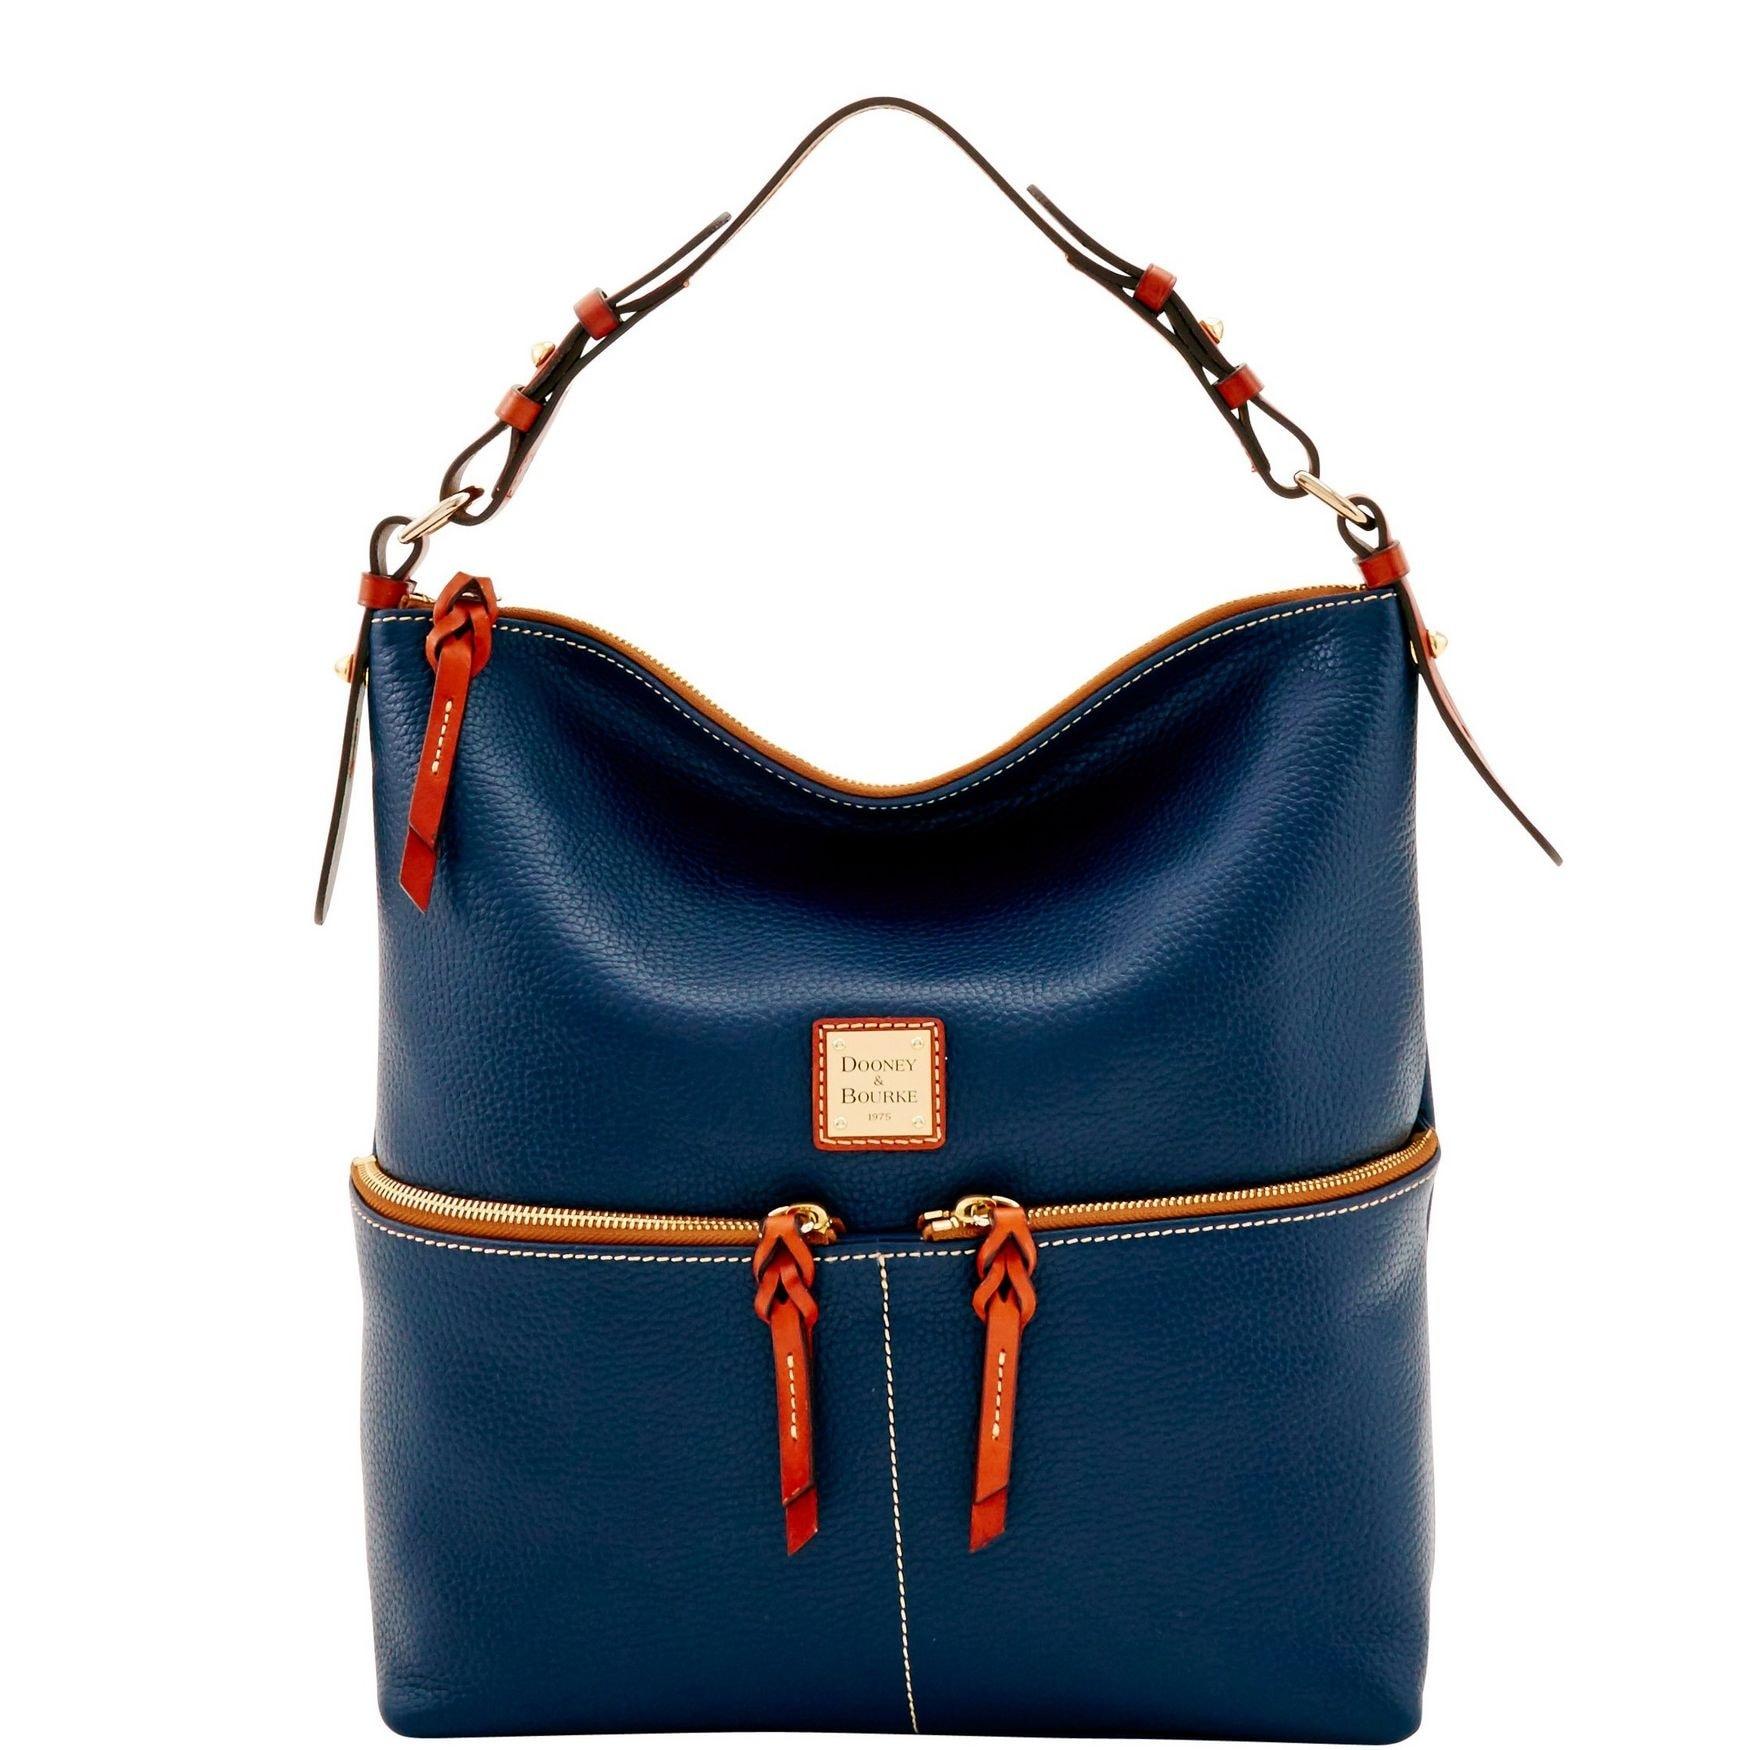 cf495dbd5d4 Designer Handbags | Shop Online at Overstock